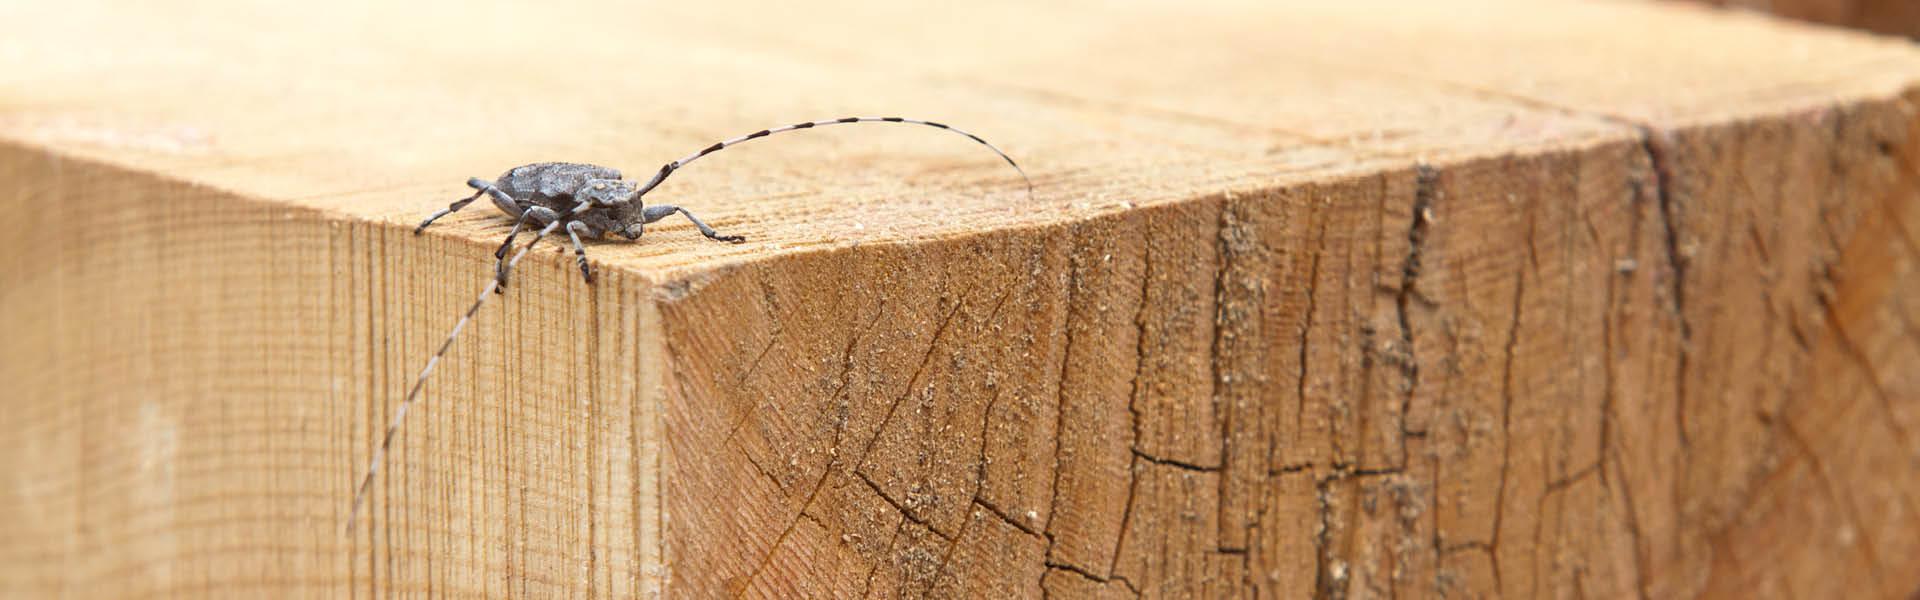 Käfer krabbelt auf Holzballken